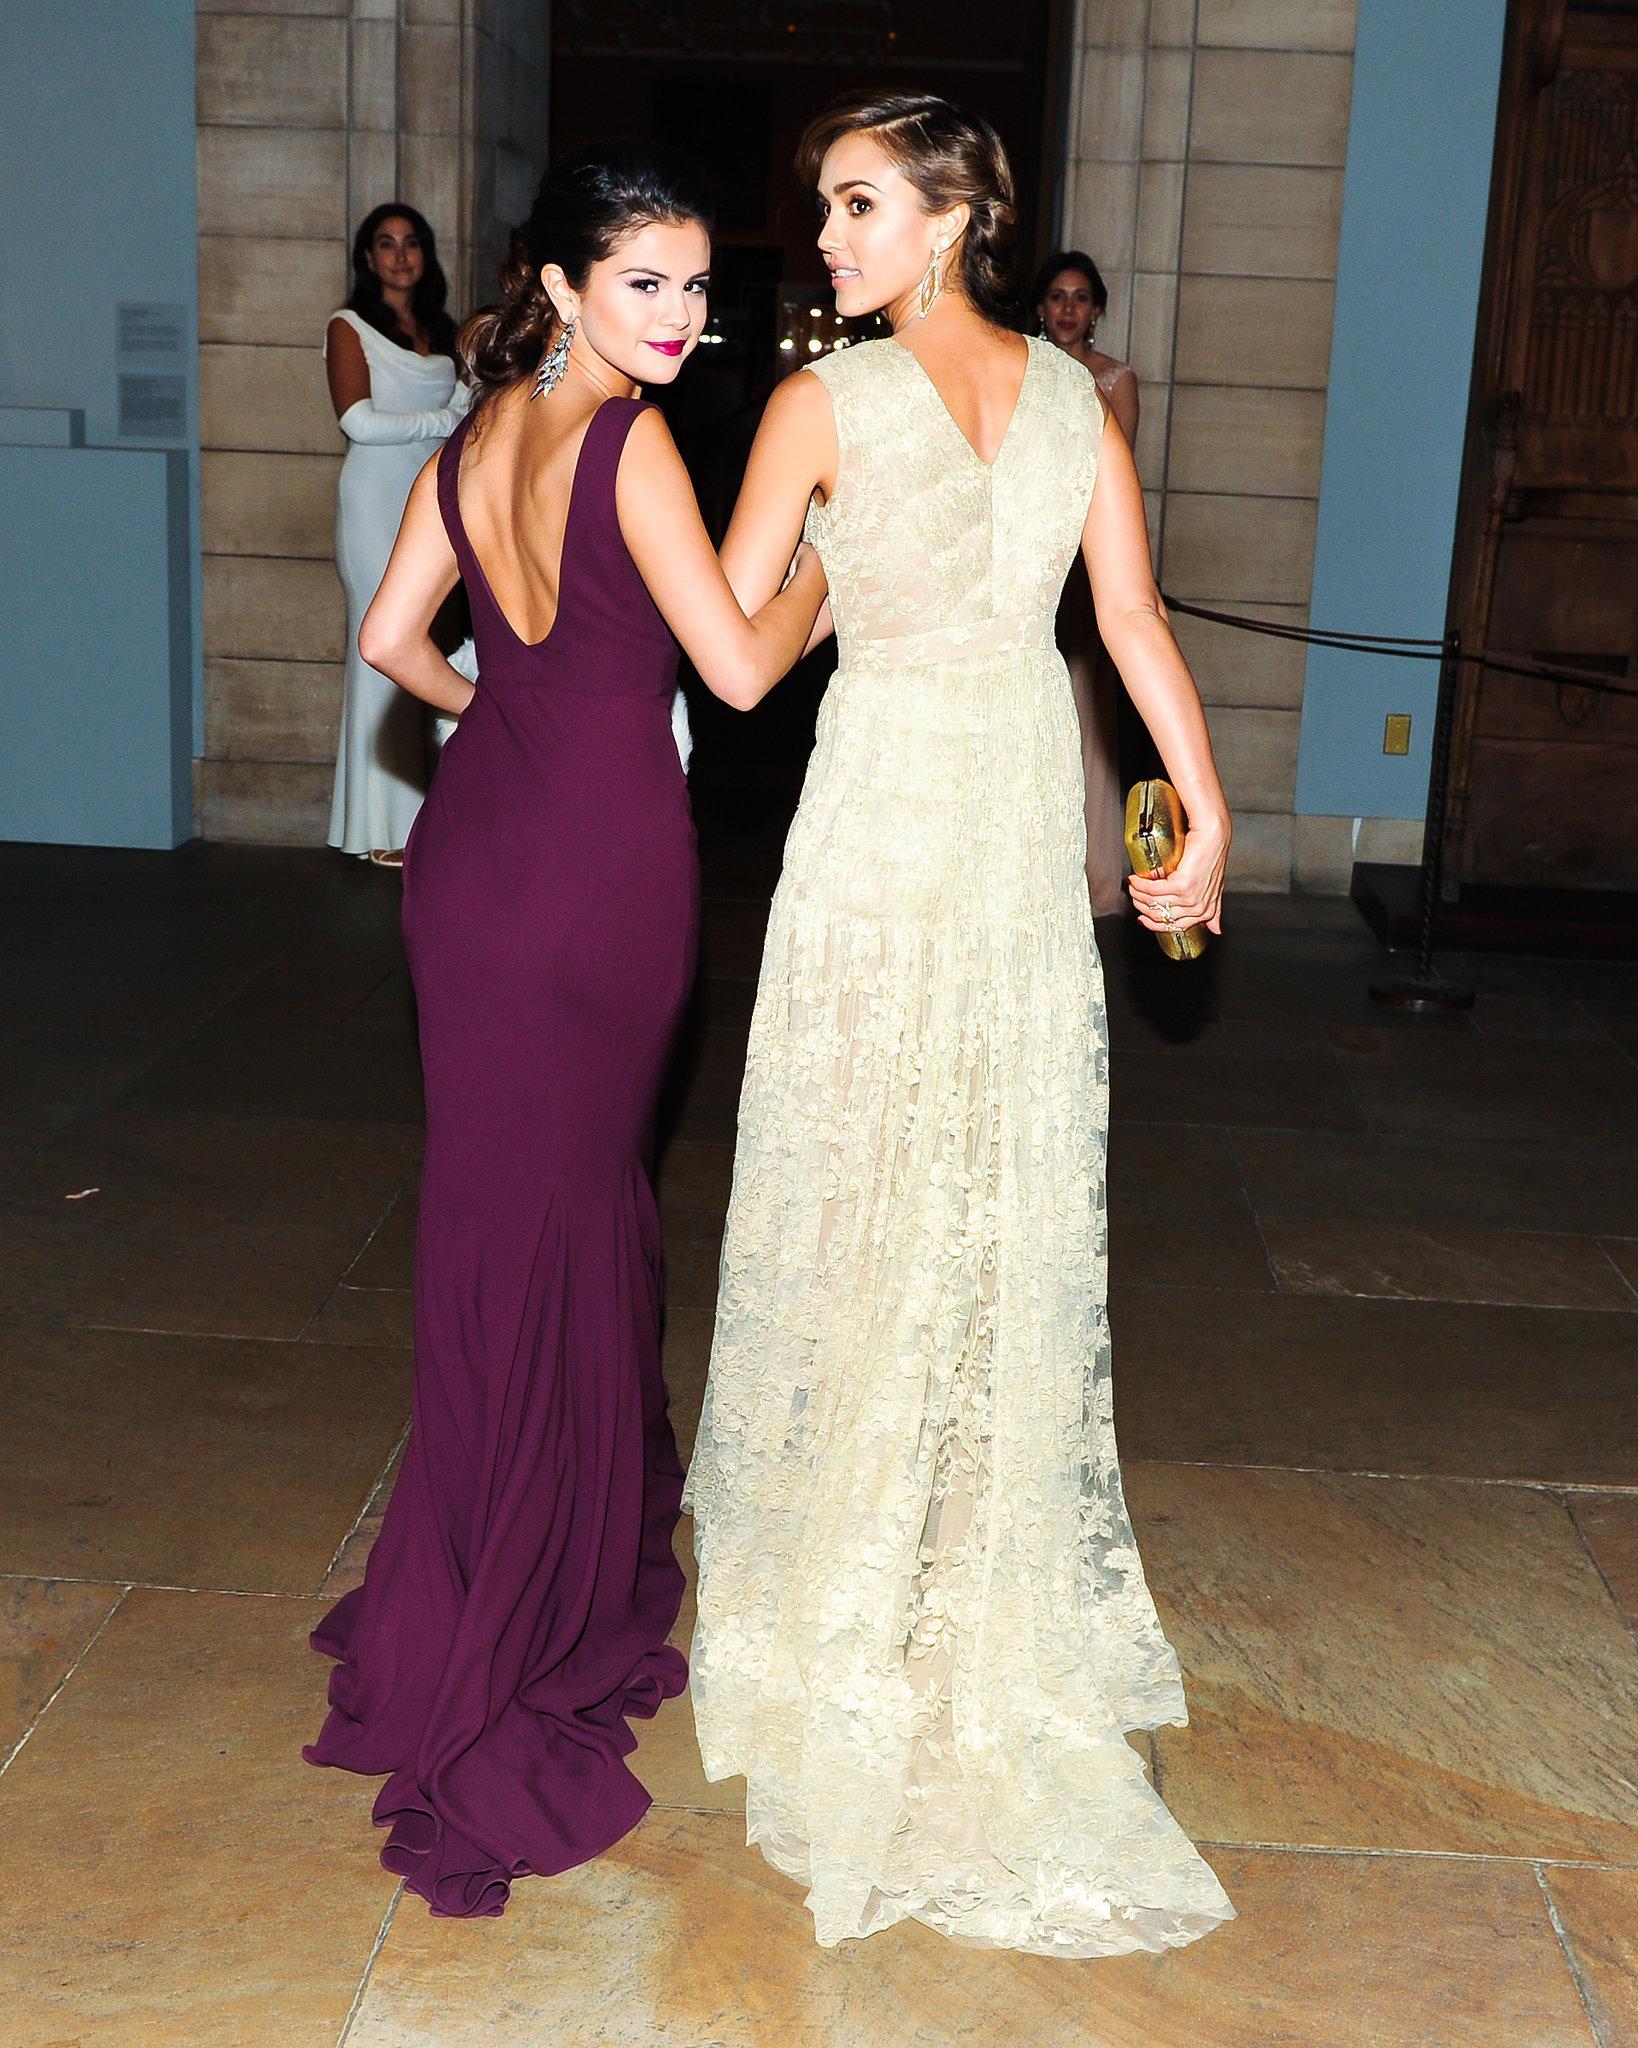 Selena Gomez And Jessica Alba Walked Arm In Arm Go